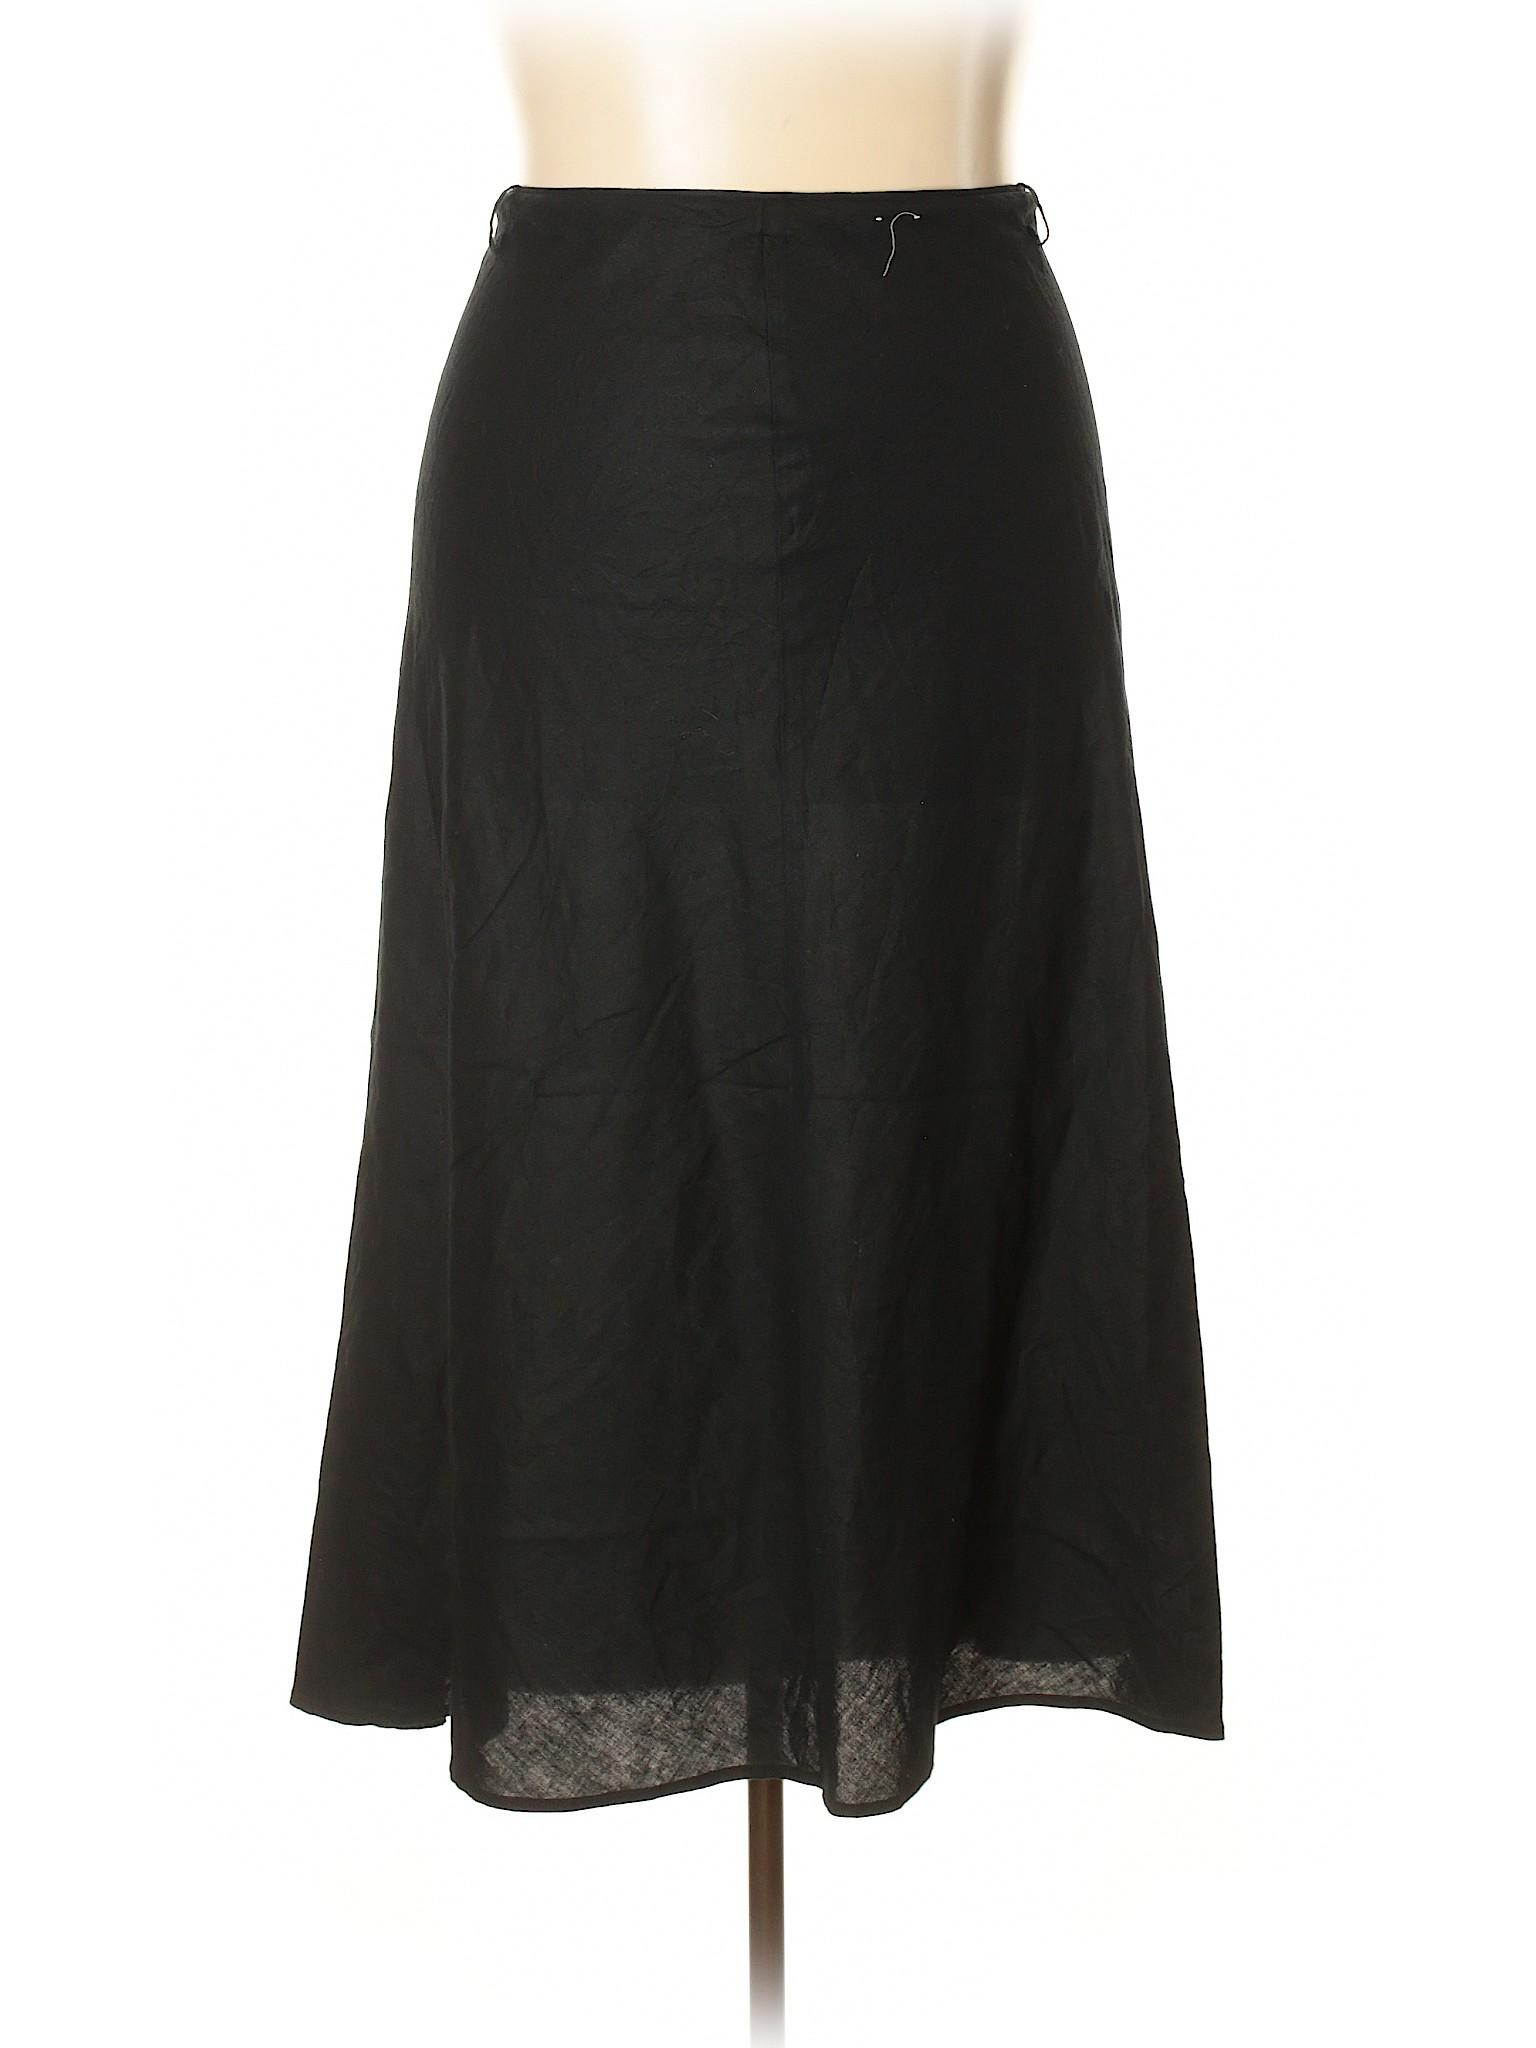 Skirt Casual Boutique Casual Boutique Casual Skirt Casual Boutique Skirt Skirt Boutique zqIUSS